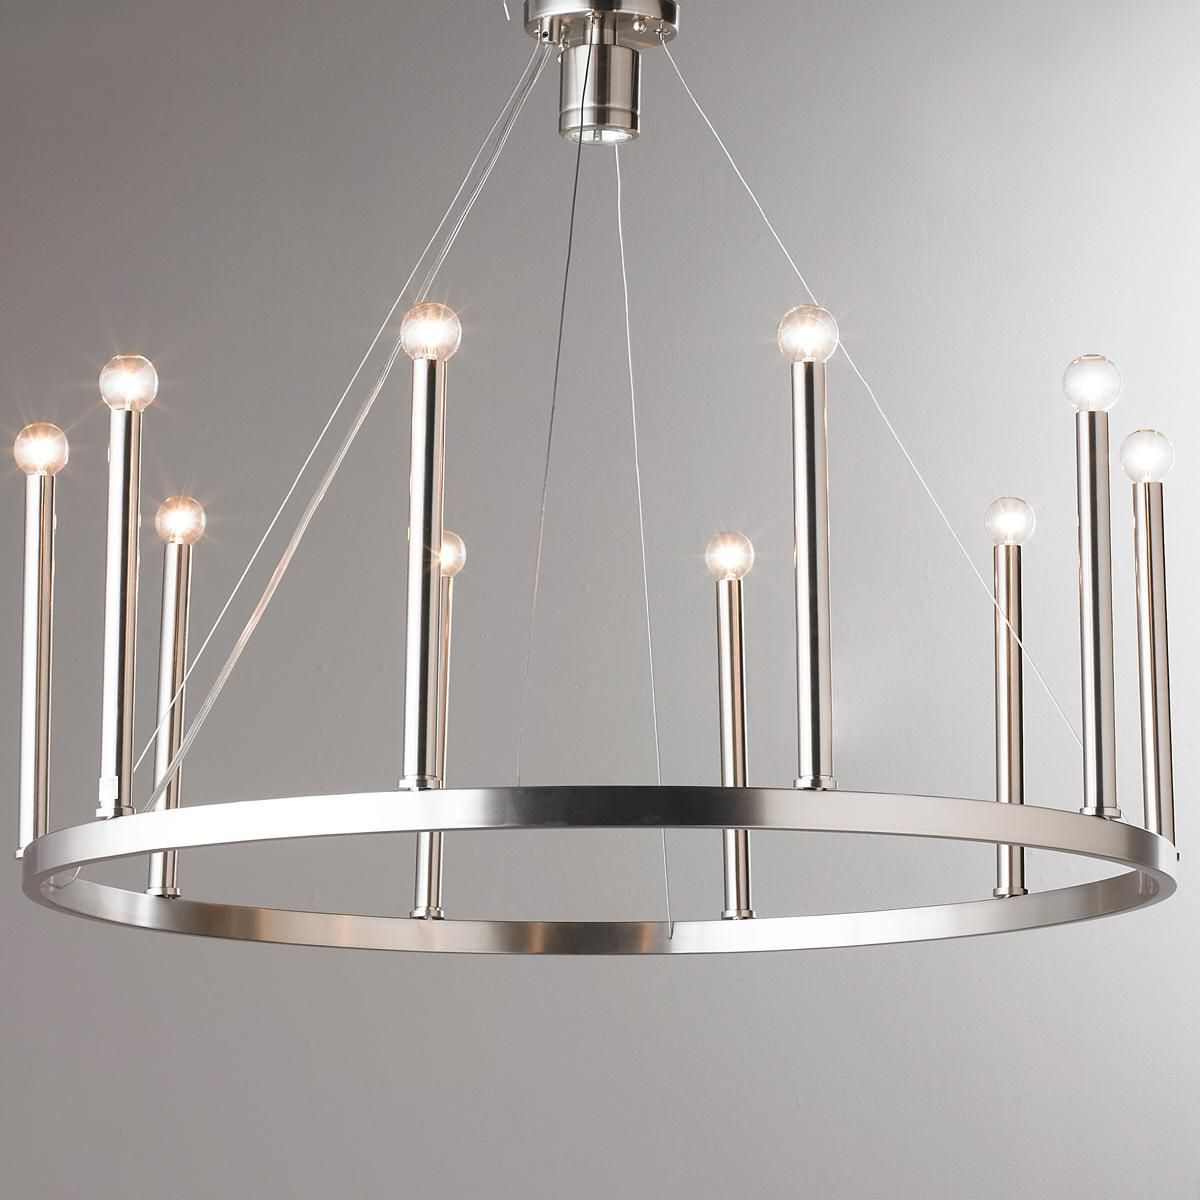 Euro Modern Candelabra Chandelier – 11 Light (View 22 of 25)